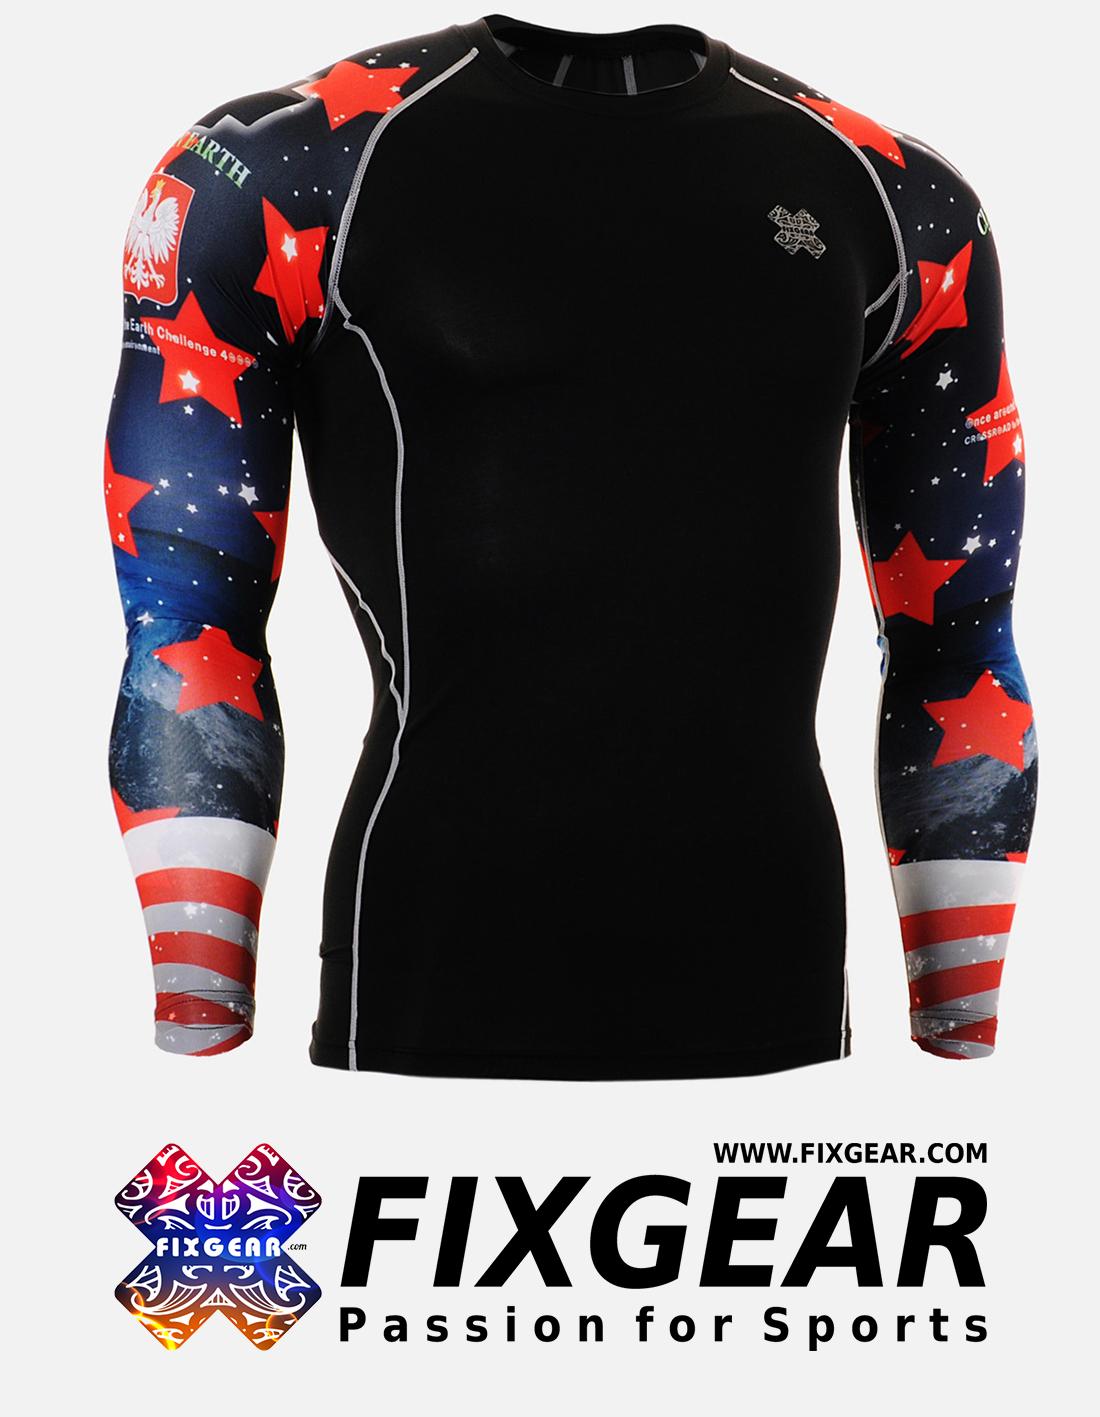 FIXGEAR CPD-B10 Compression Base Layer Shirt